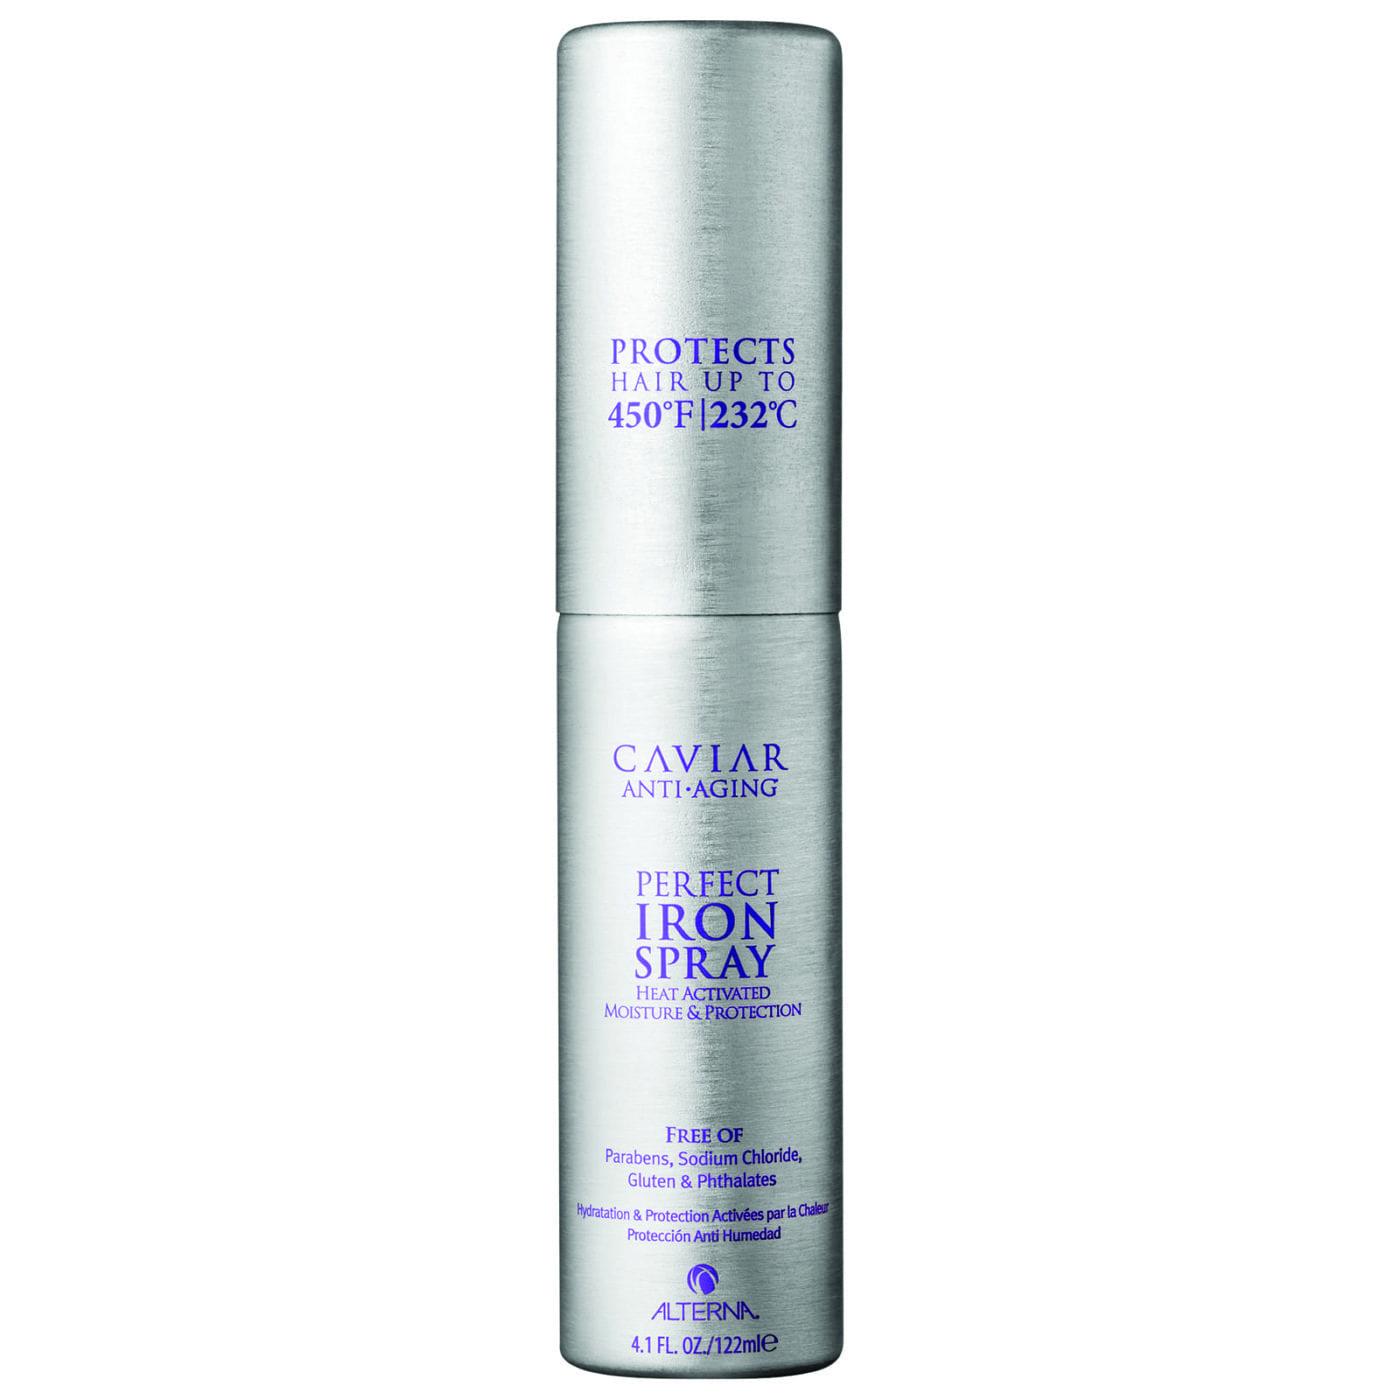 Alterna Caviar Perfect Iron Spray 122ml